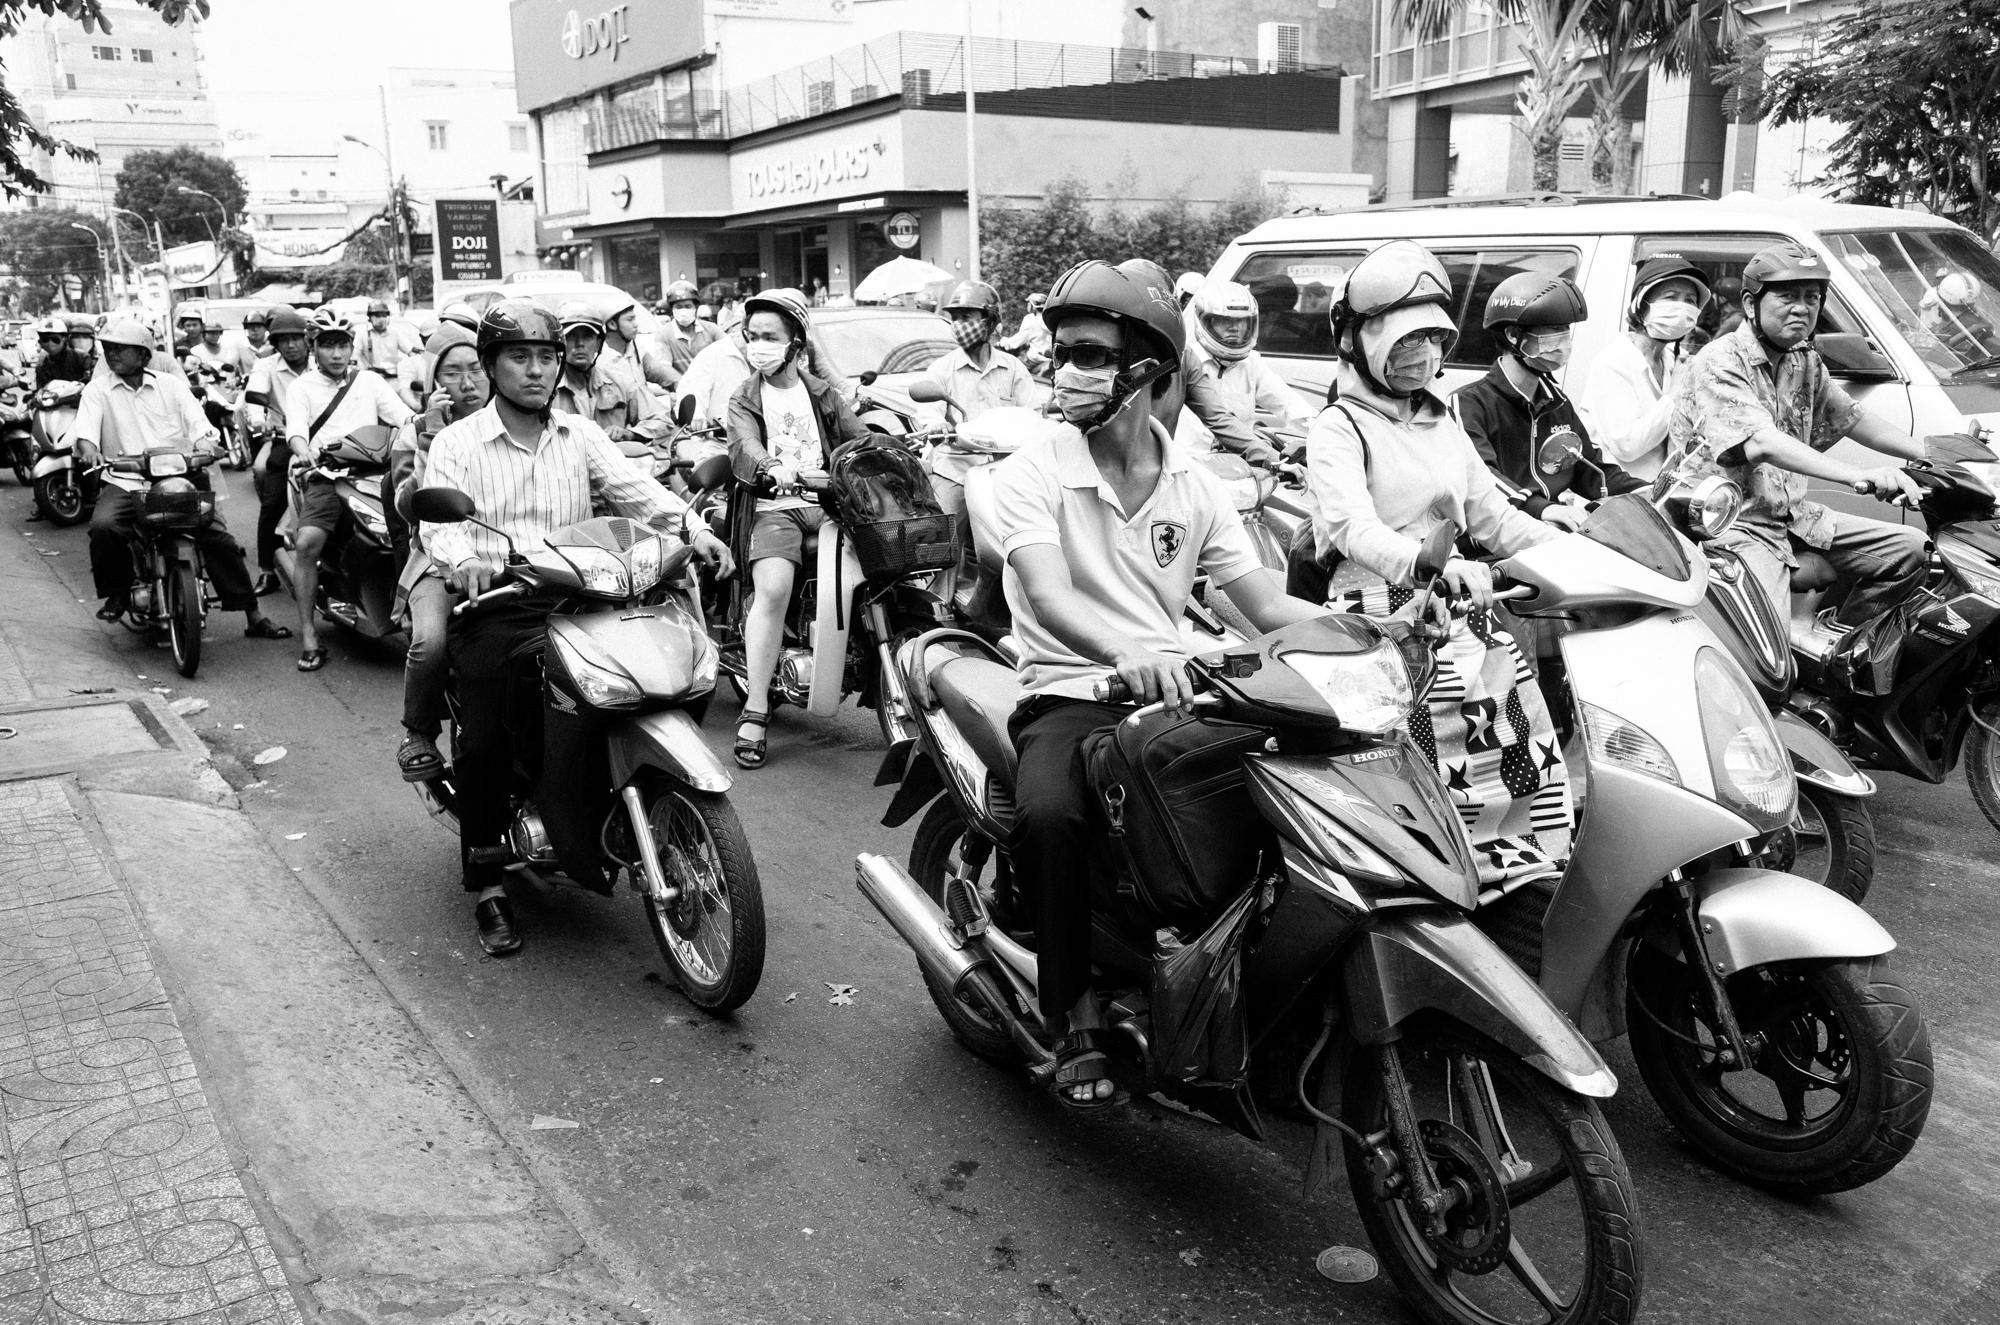 huynh_traffic jam_8